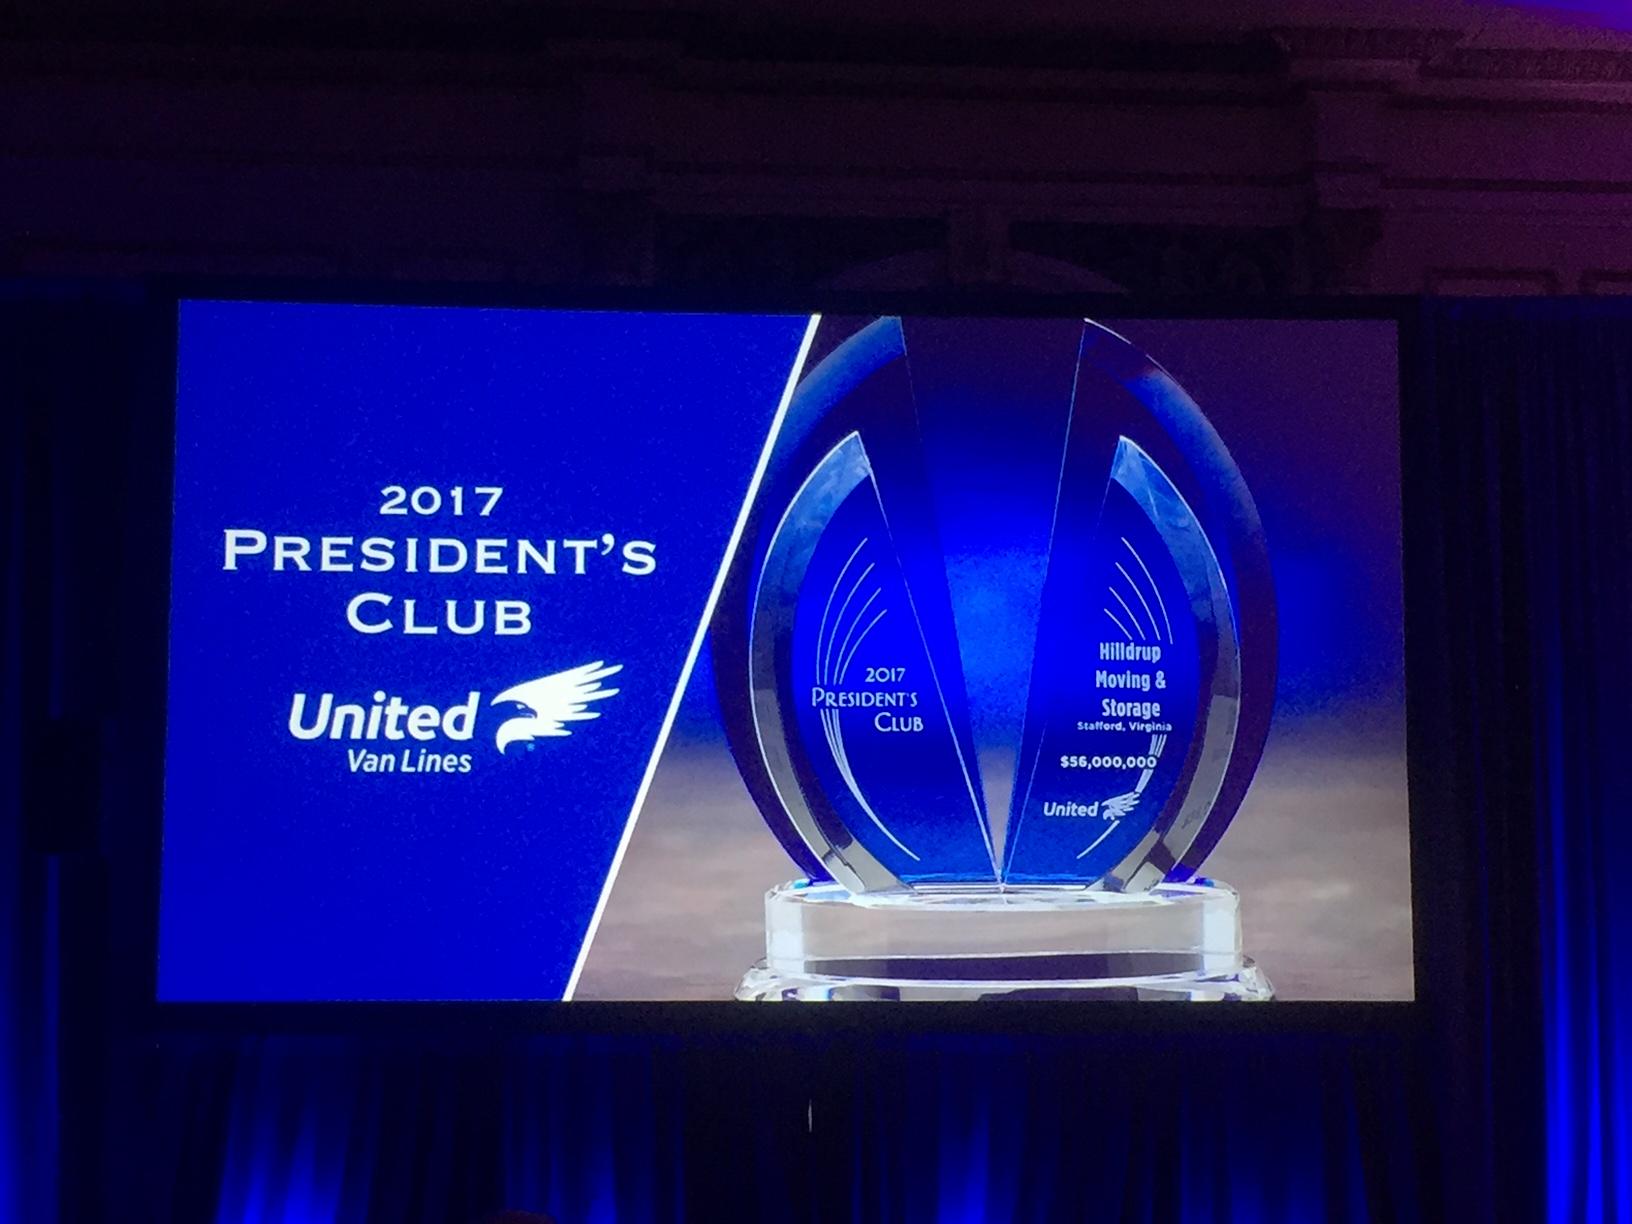 2017 President's Club award on screen